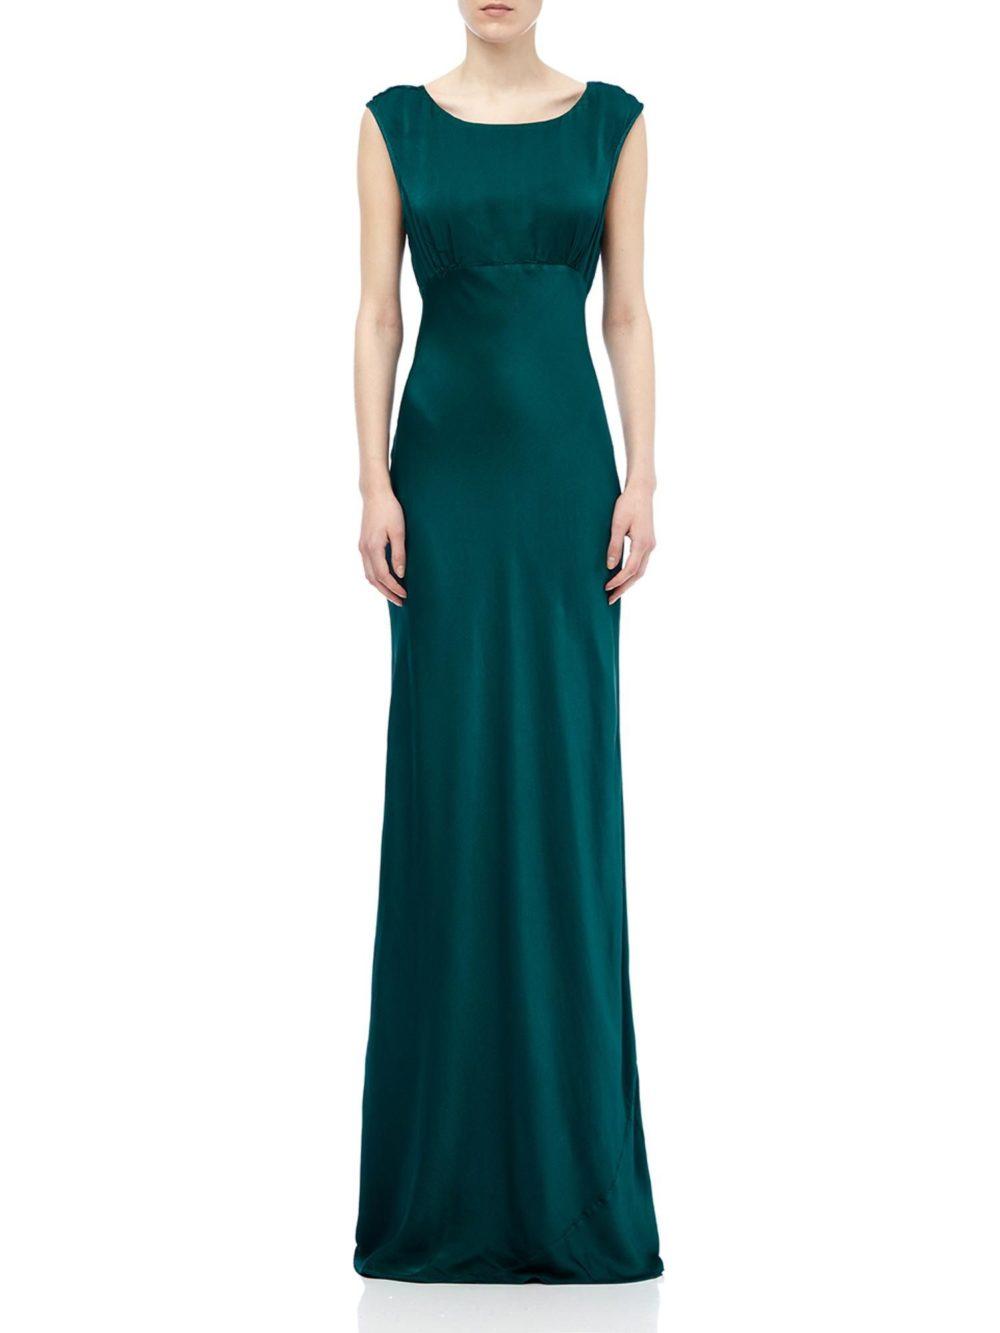 Salma dress Ghost bridesmaid